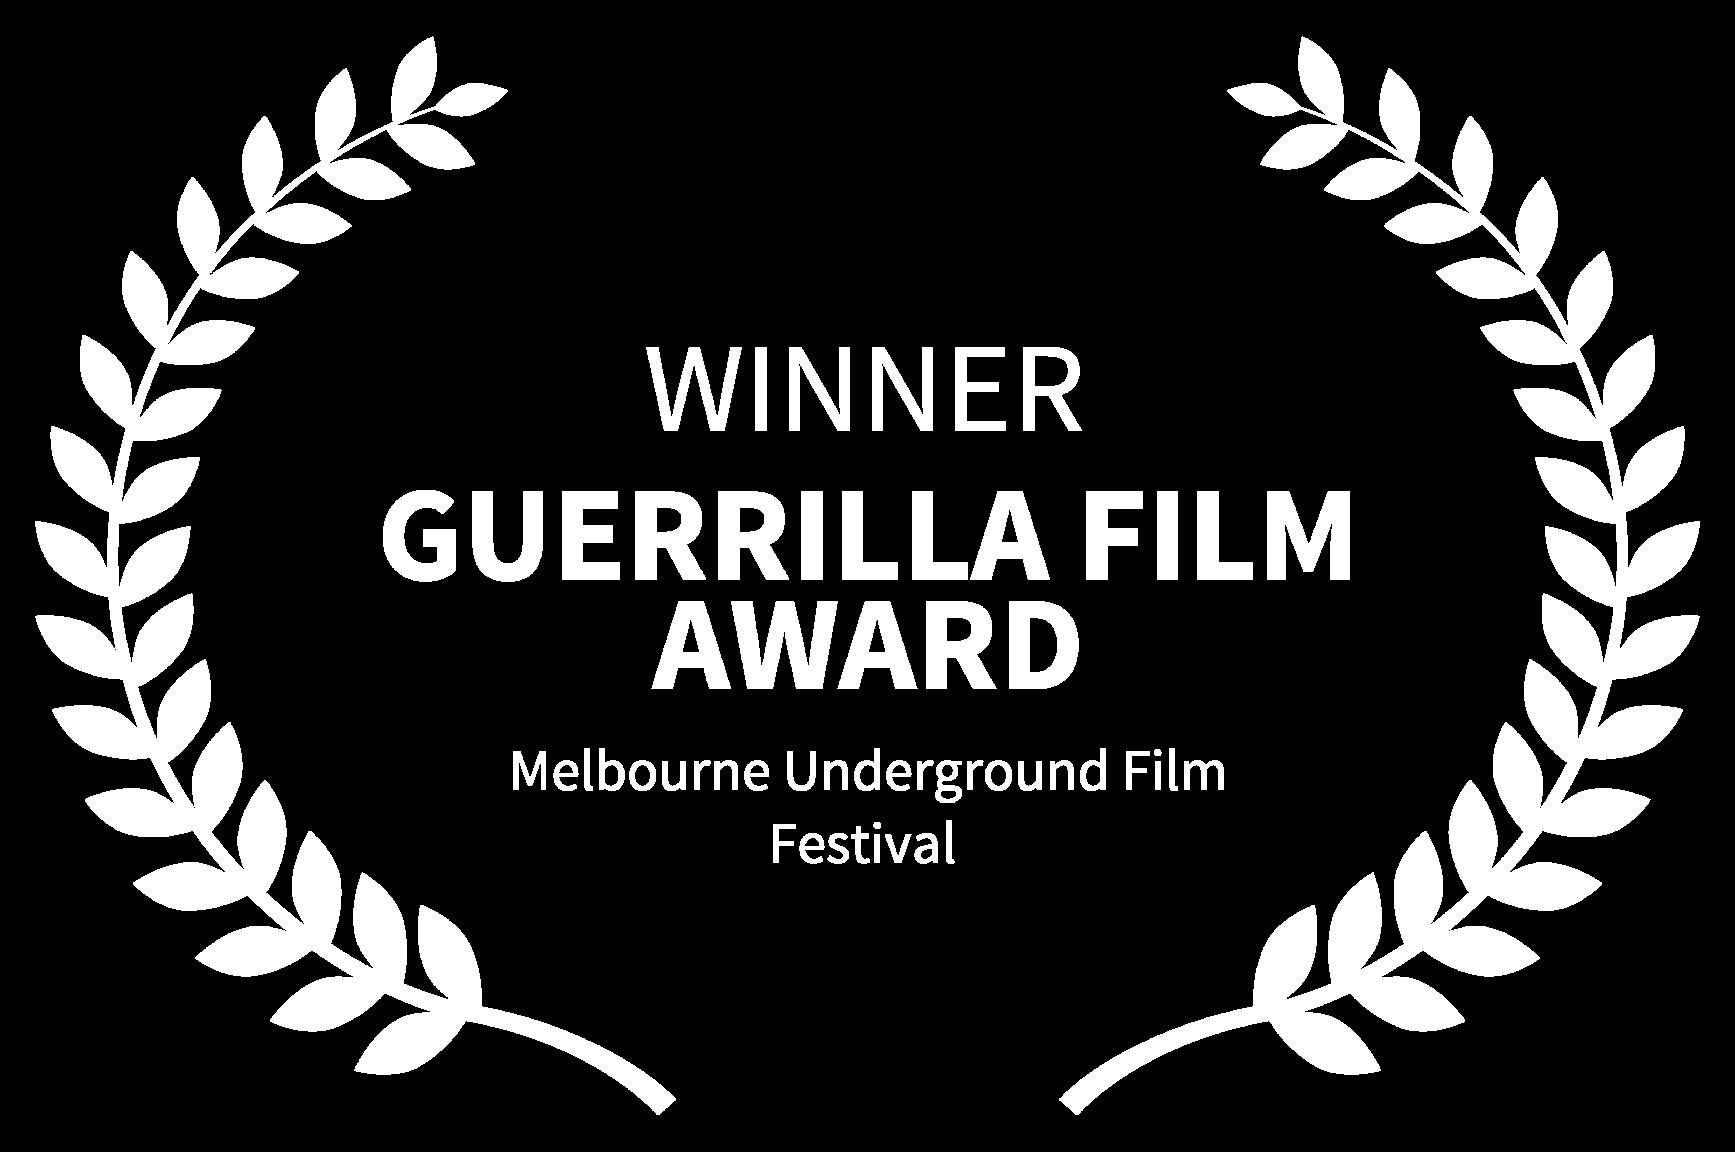 WINNER - GUERRILLA FILM AWARD - Melbourne Underground Film Festival